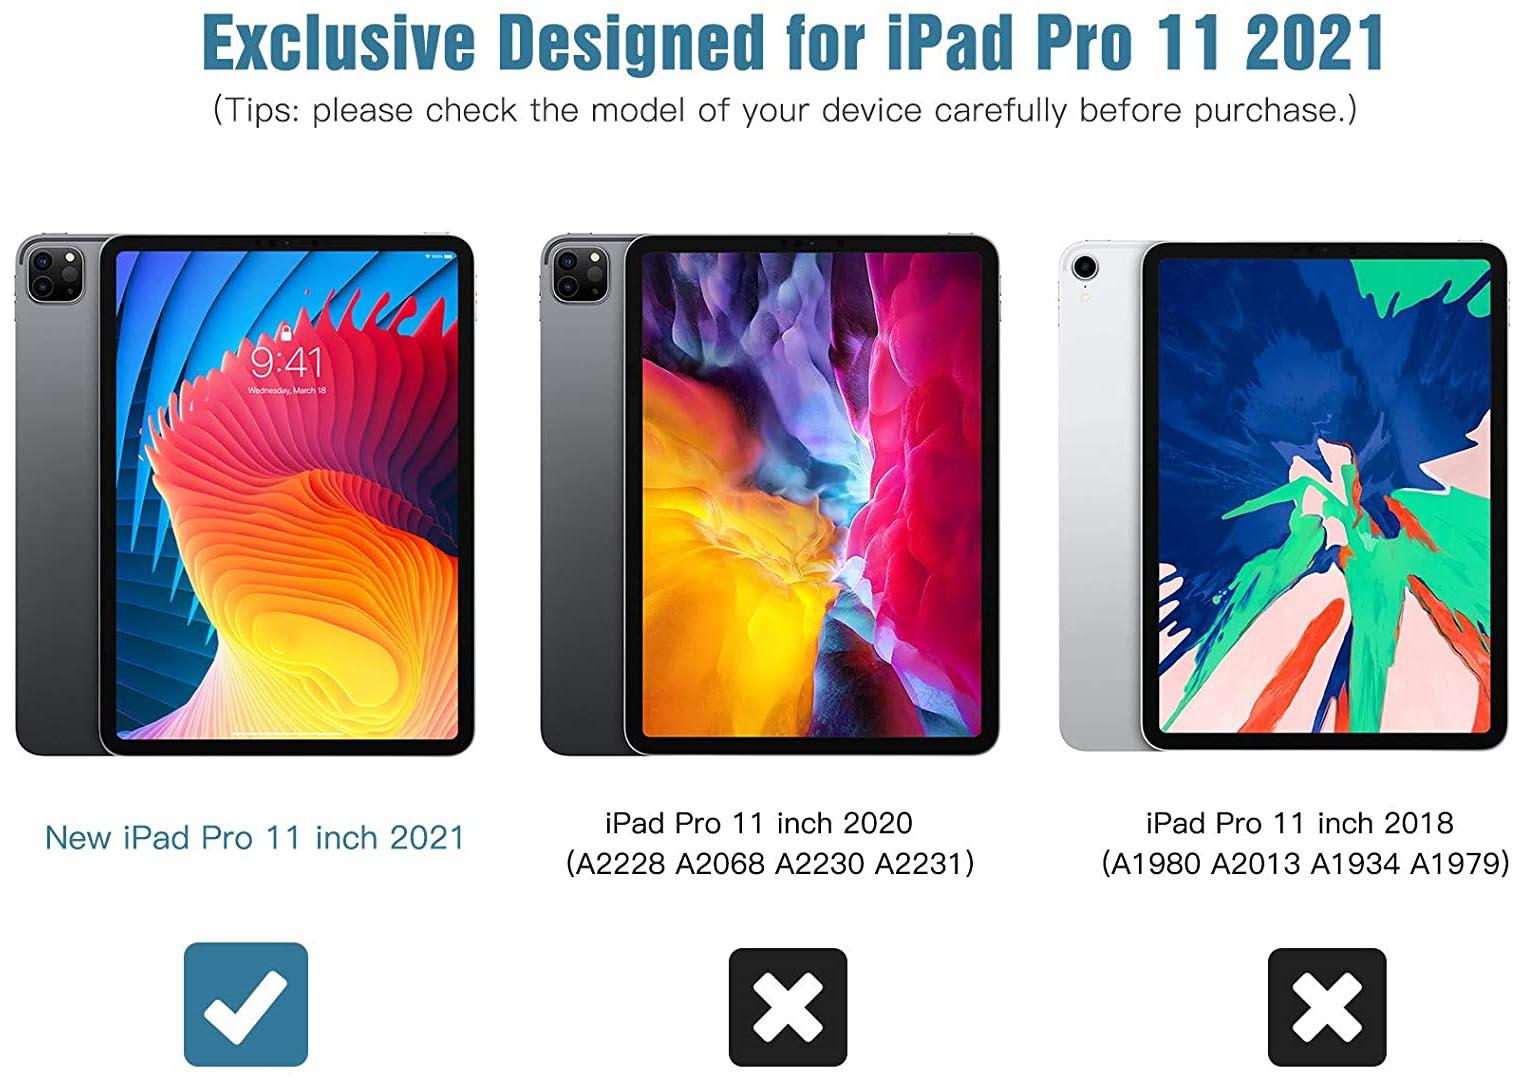 Compatibilité coque iPad Pro 2021